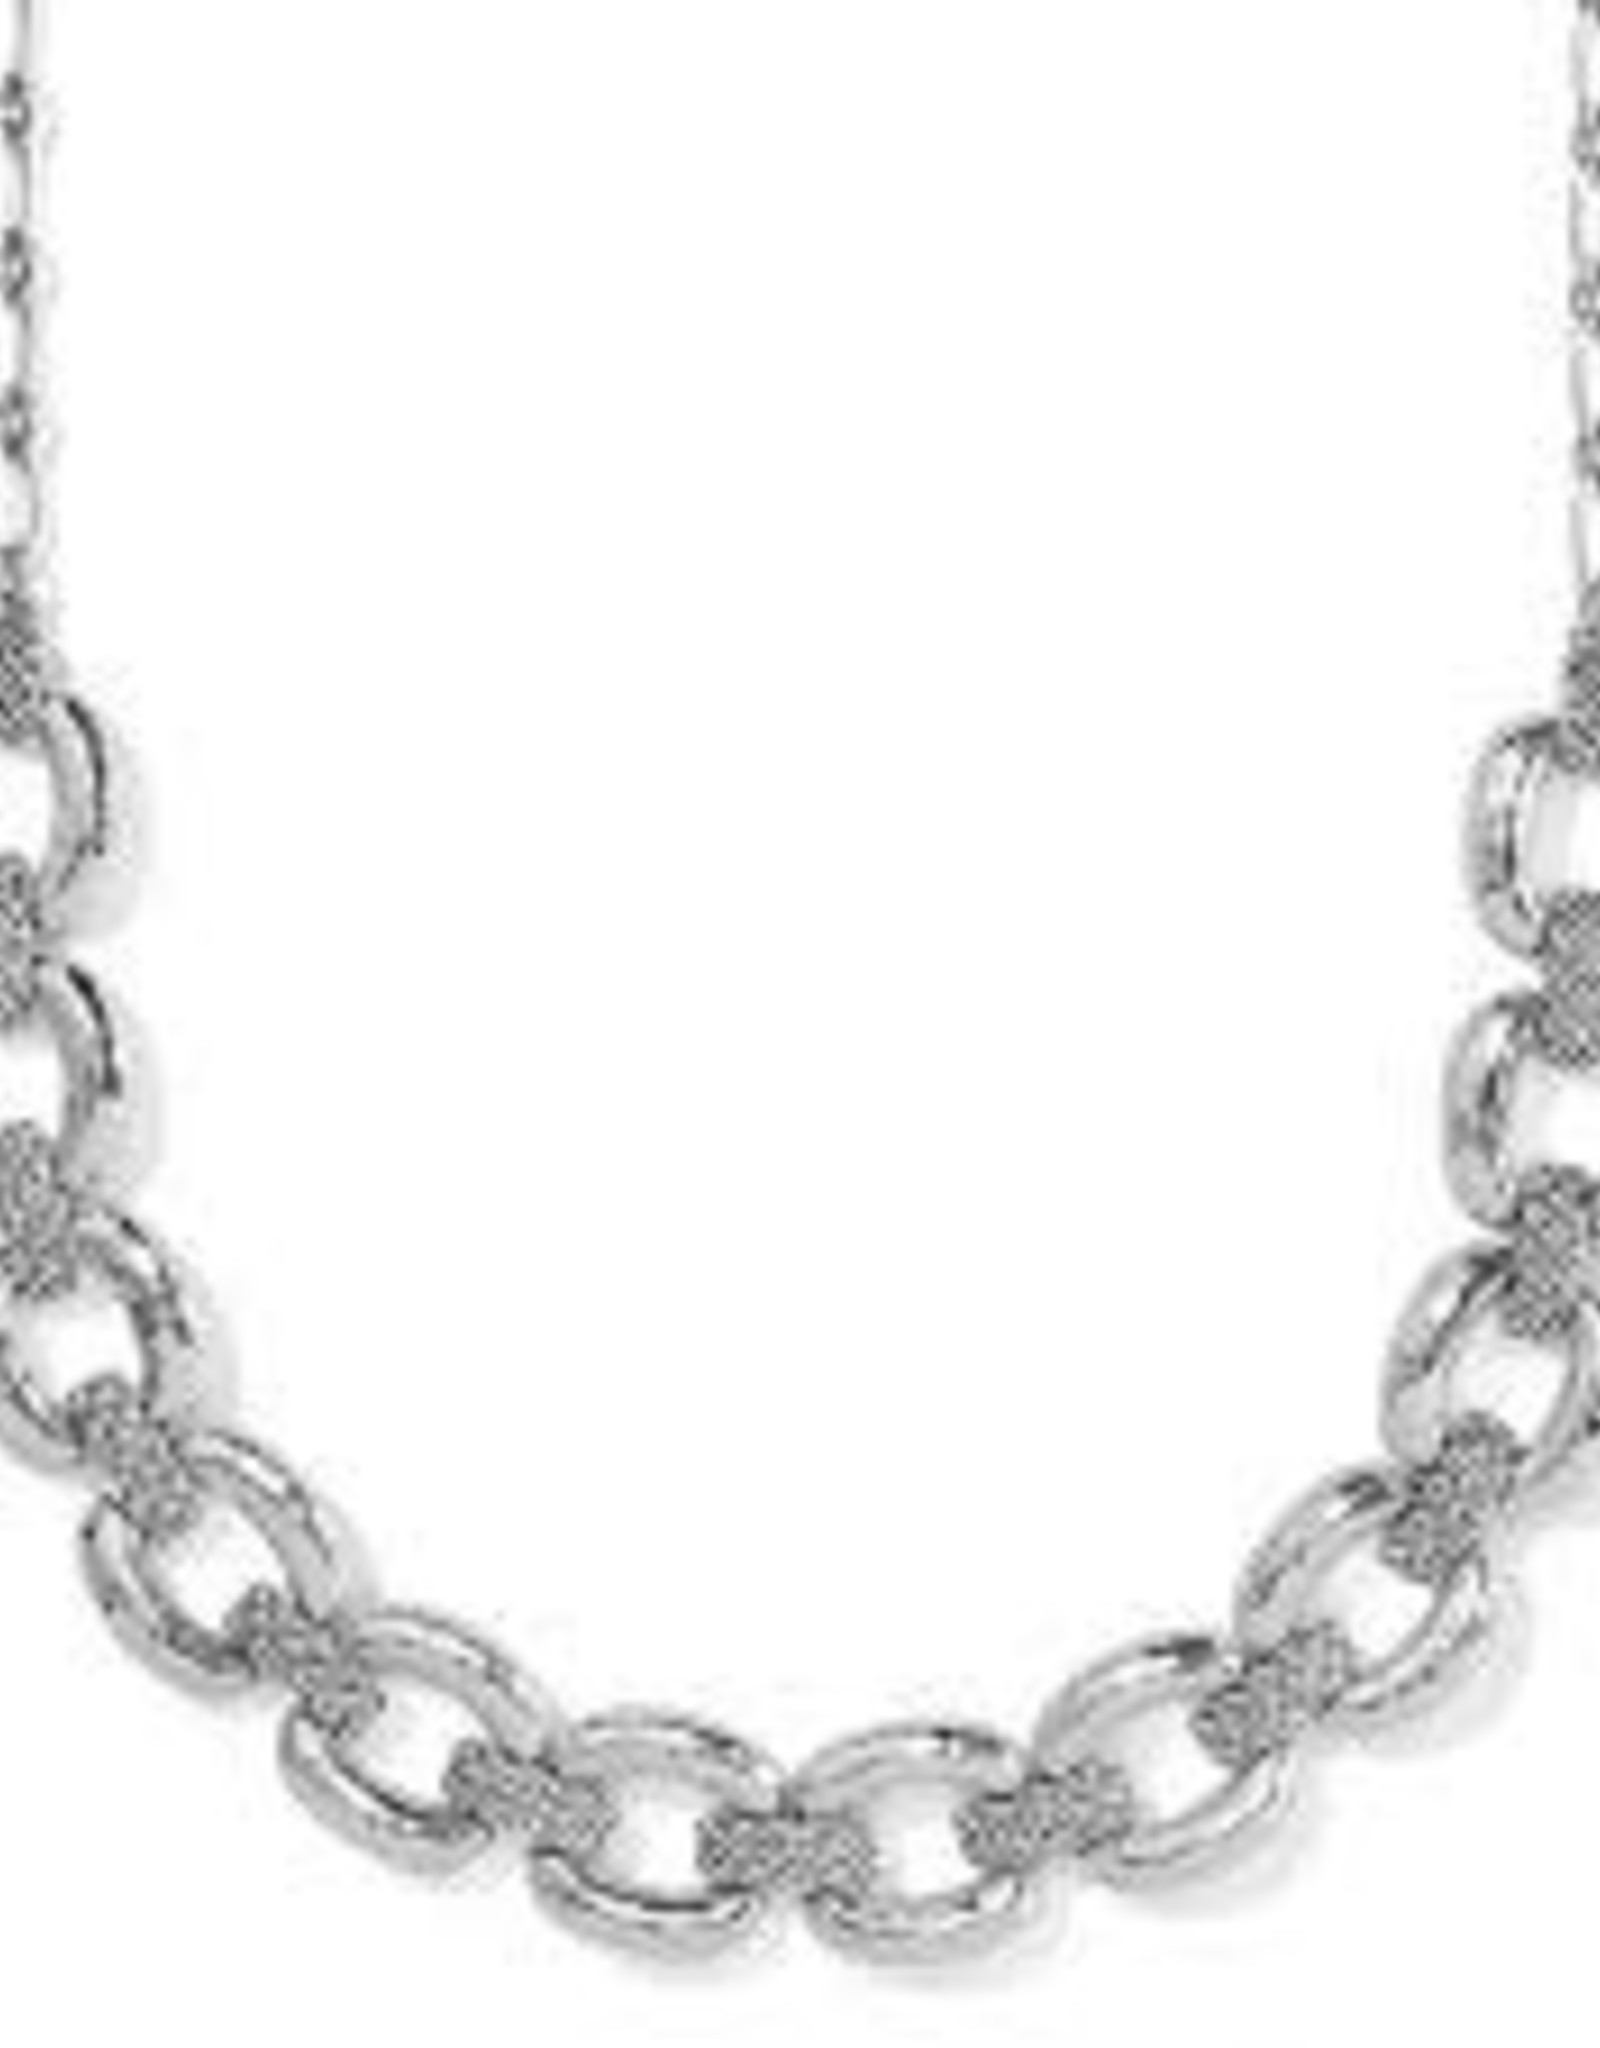 Brighton Brighton Necklace Interlok Woven Collar